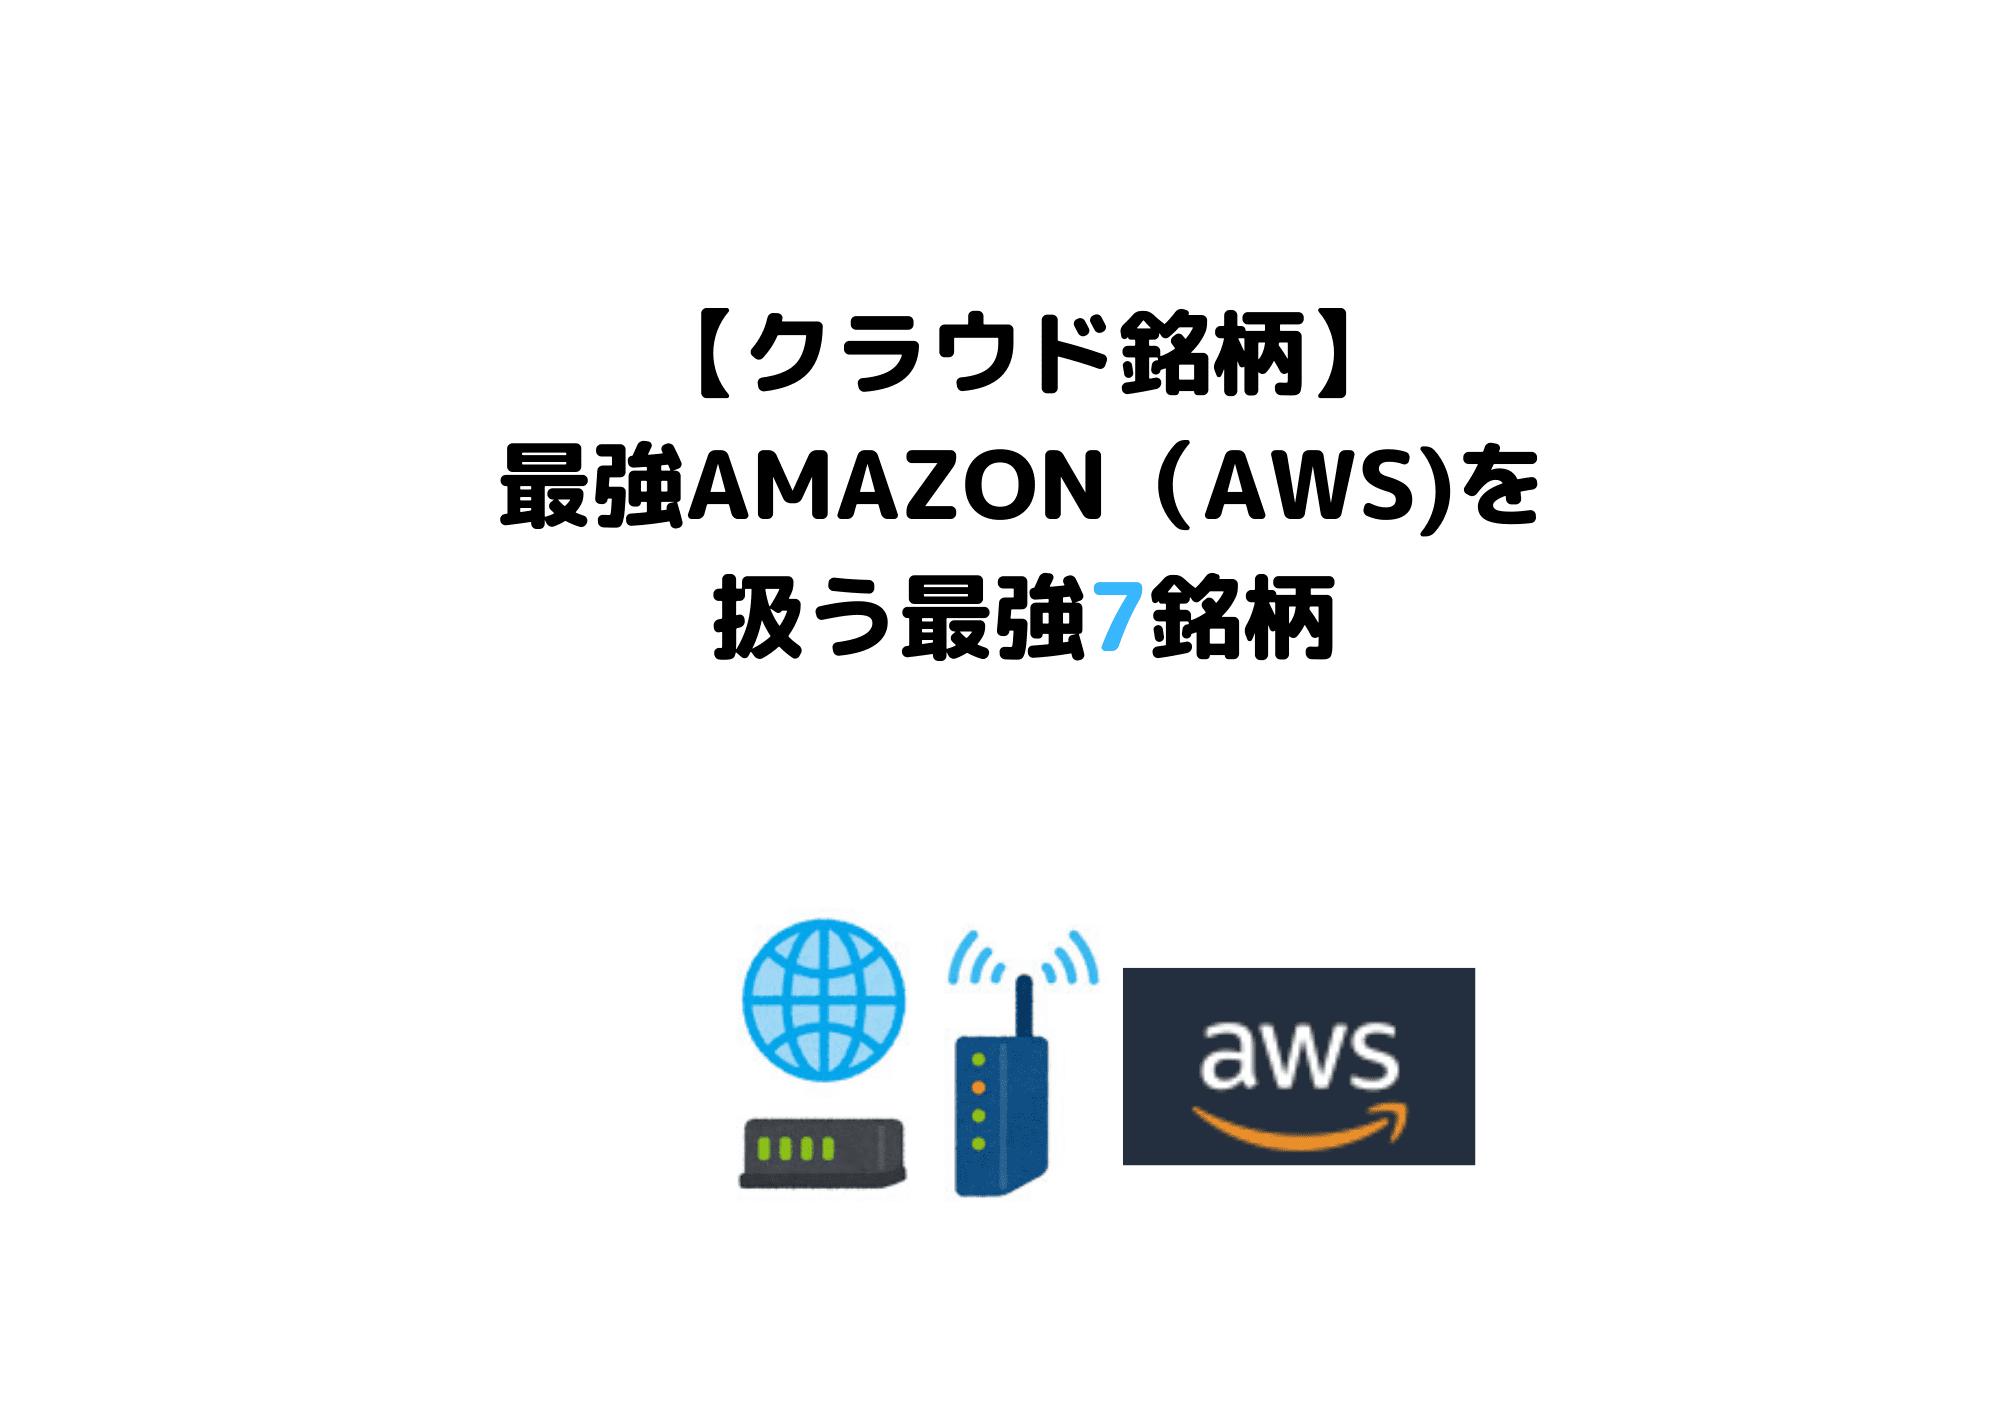 AWS Amazon クラウド (1)